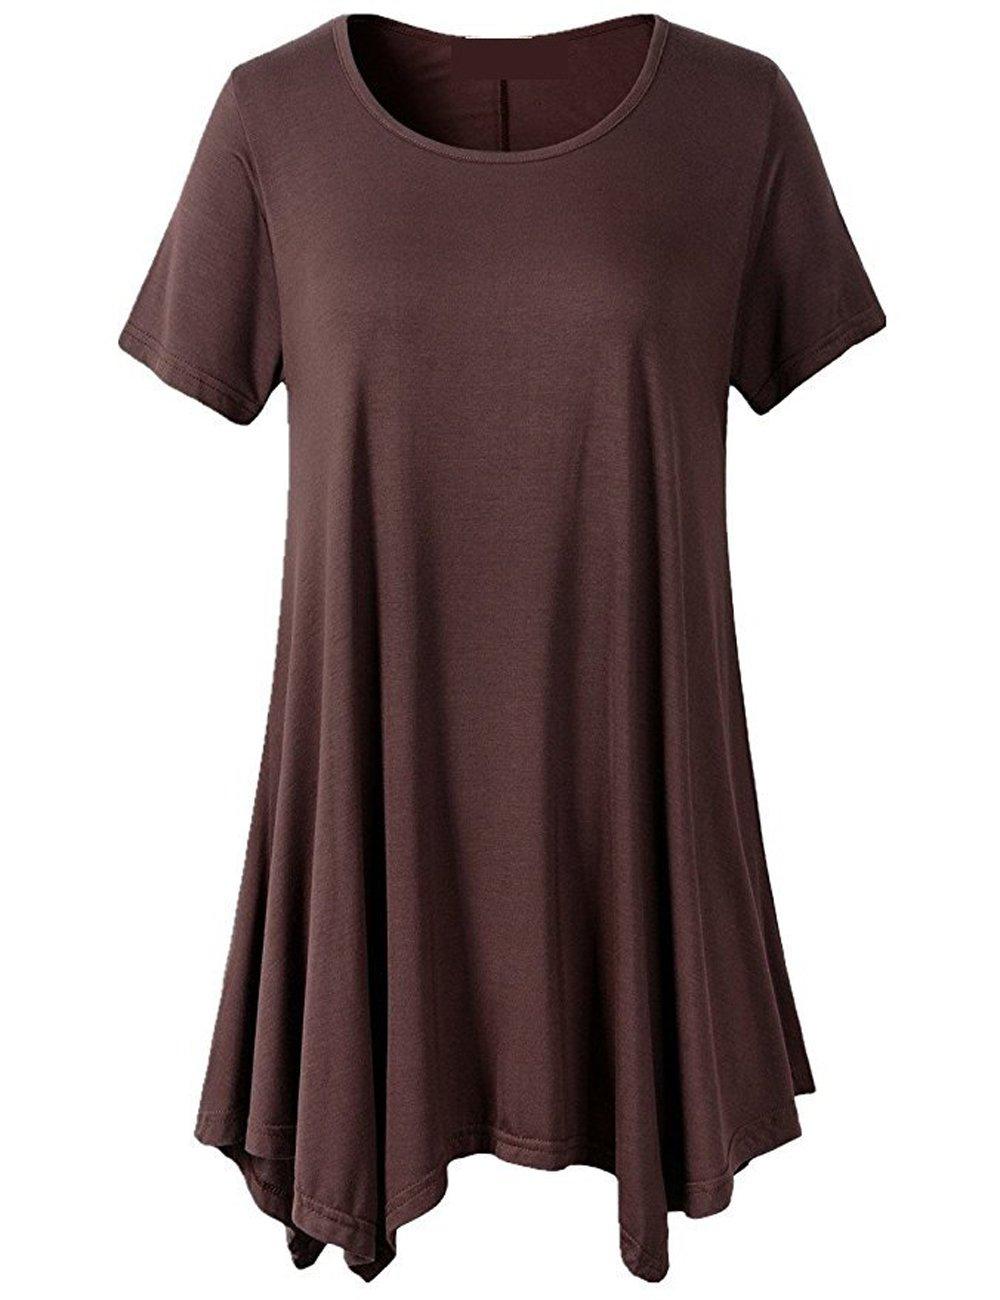 Women Swing Tunic Tops Comfy Flattering T Shirt (XXXL, Brown)